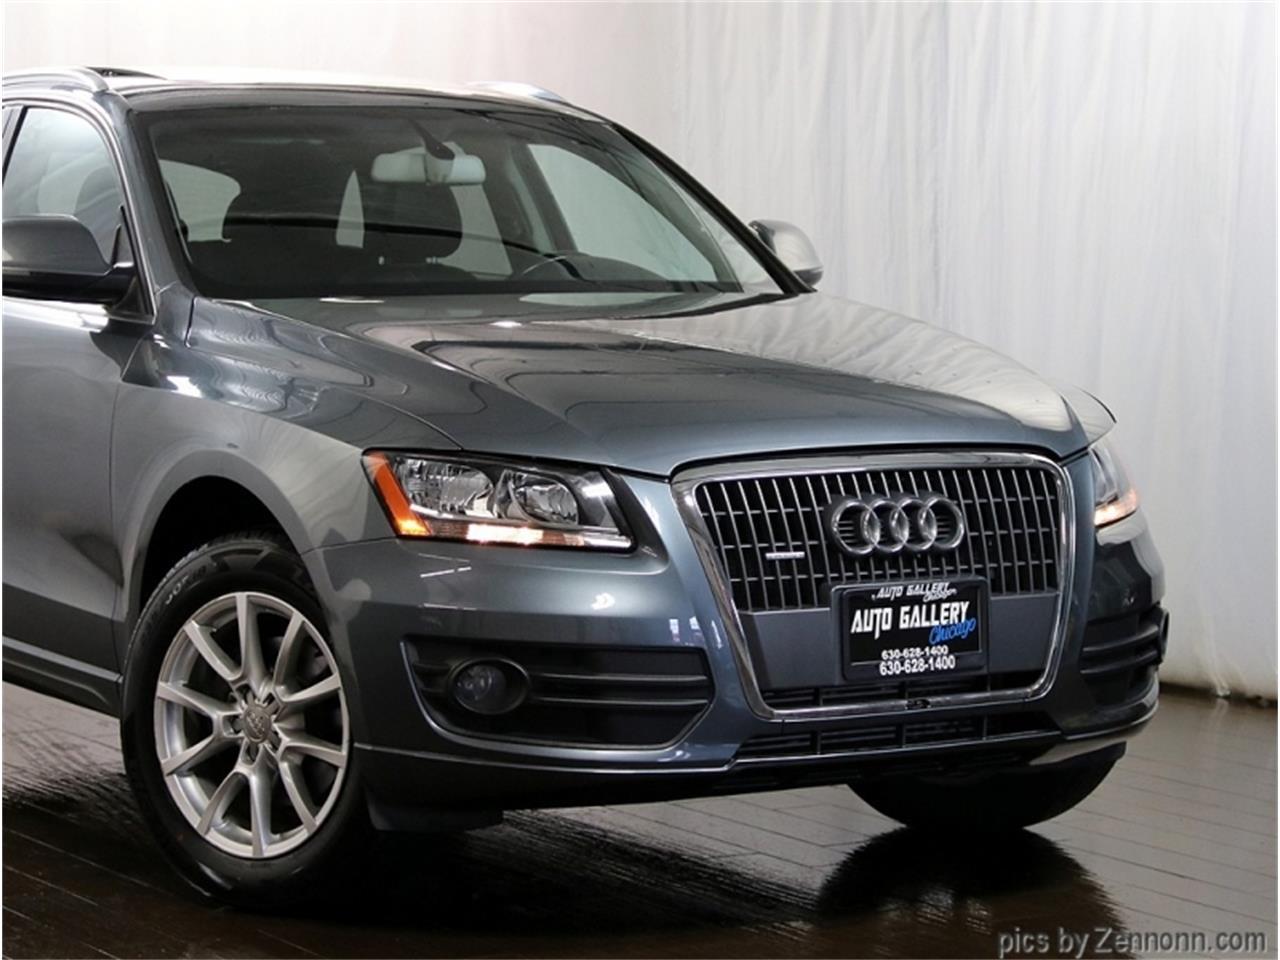 2012 Audi Q5 (CC-1379549) for sale in Addison, Illinois